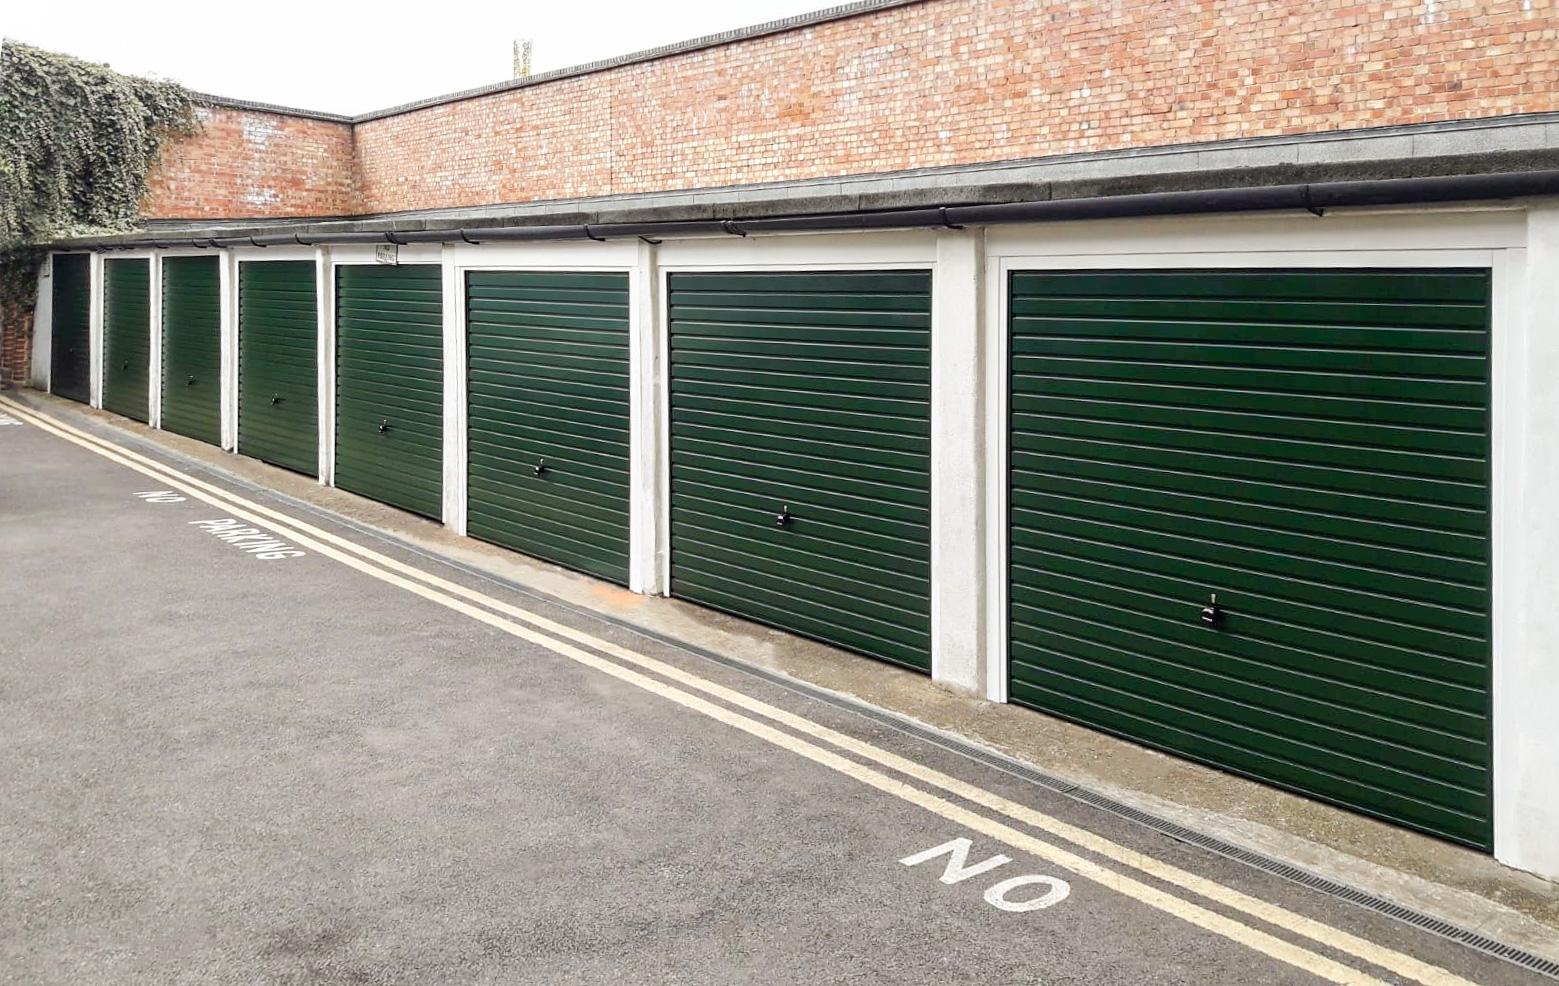 Garador Horizon Steel Up & Over Garage Doors Finished in Fir Green